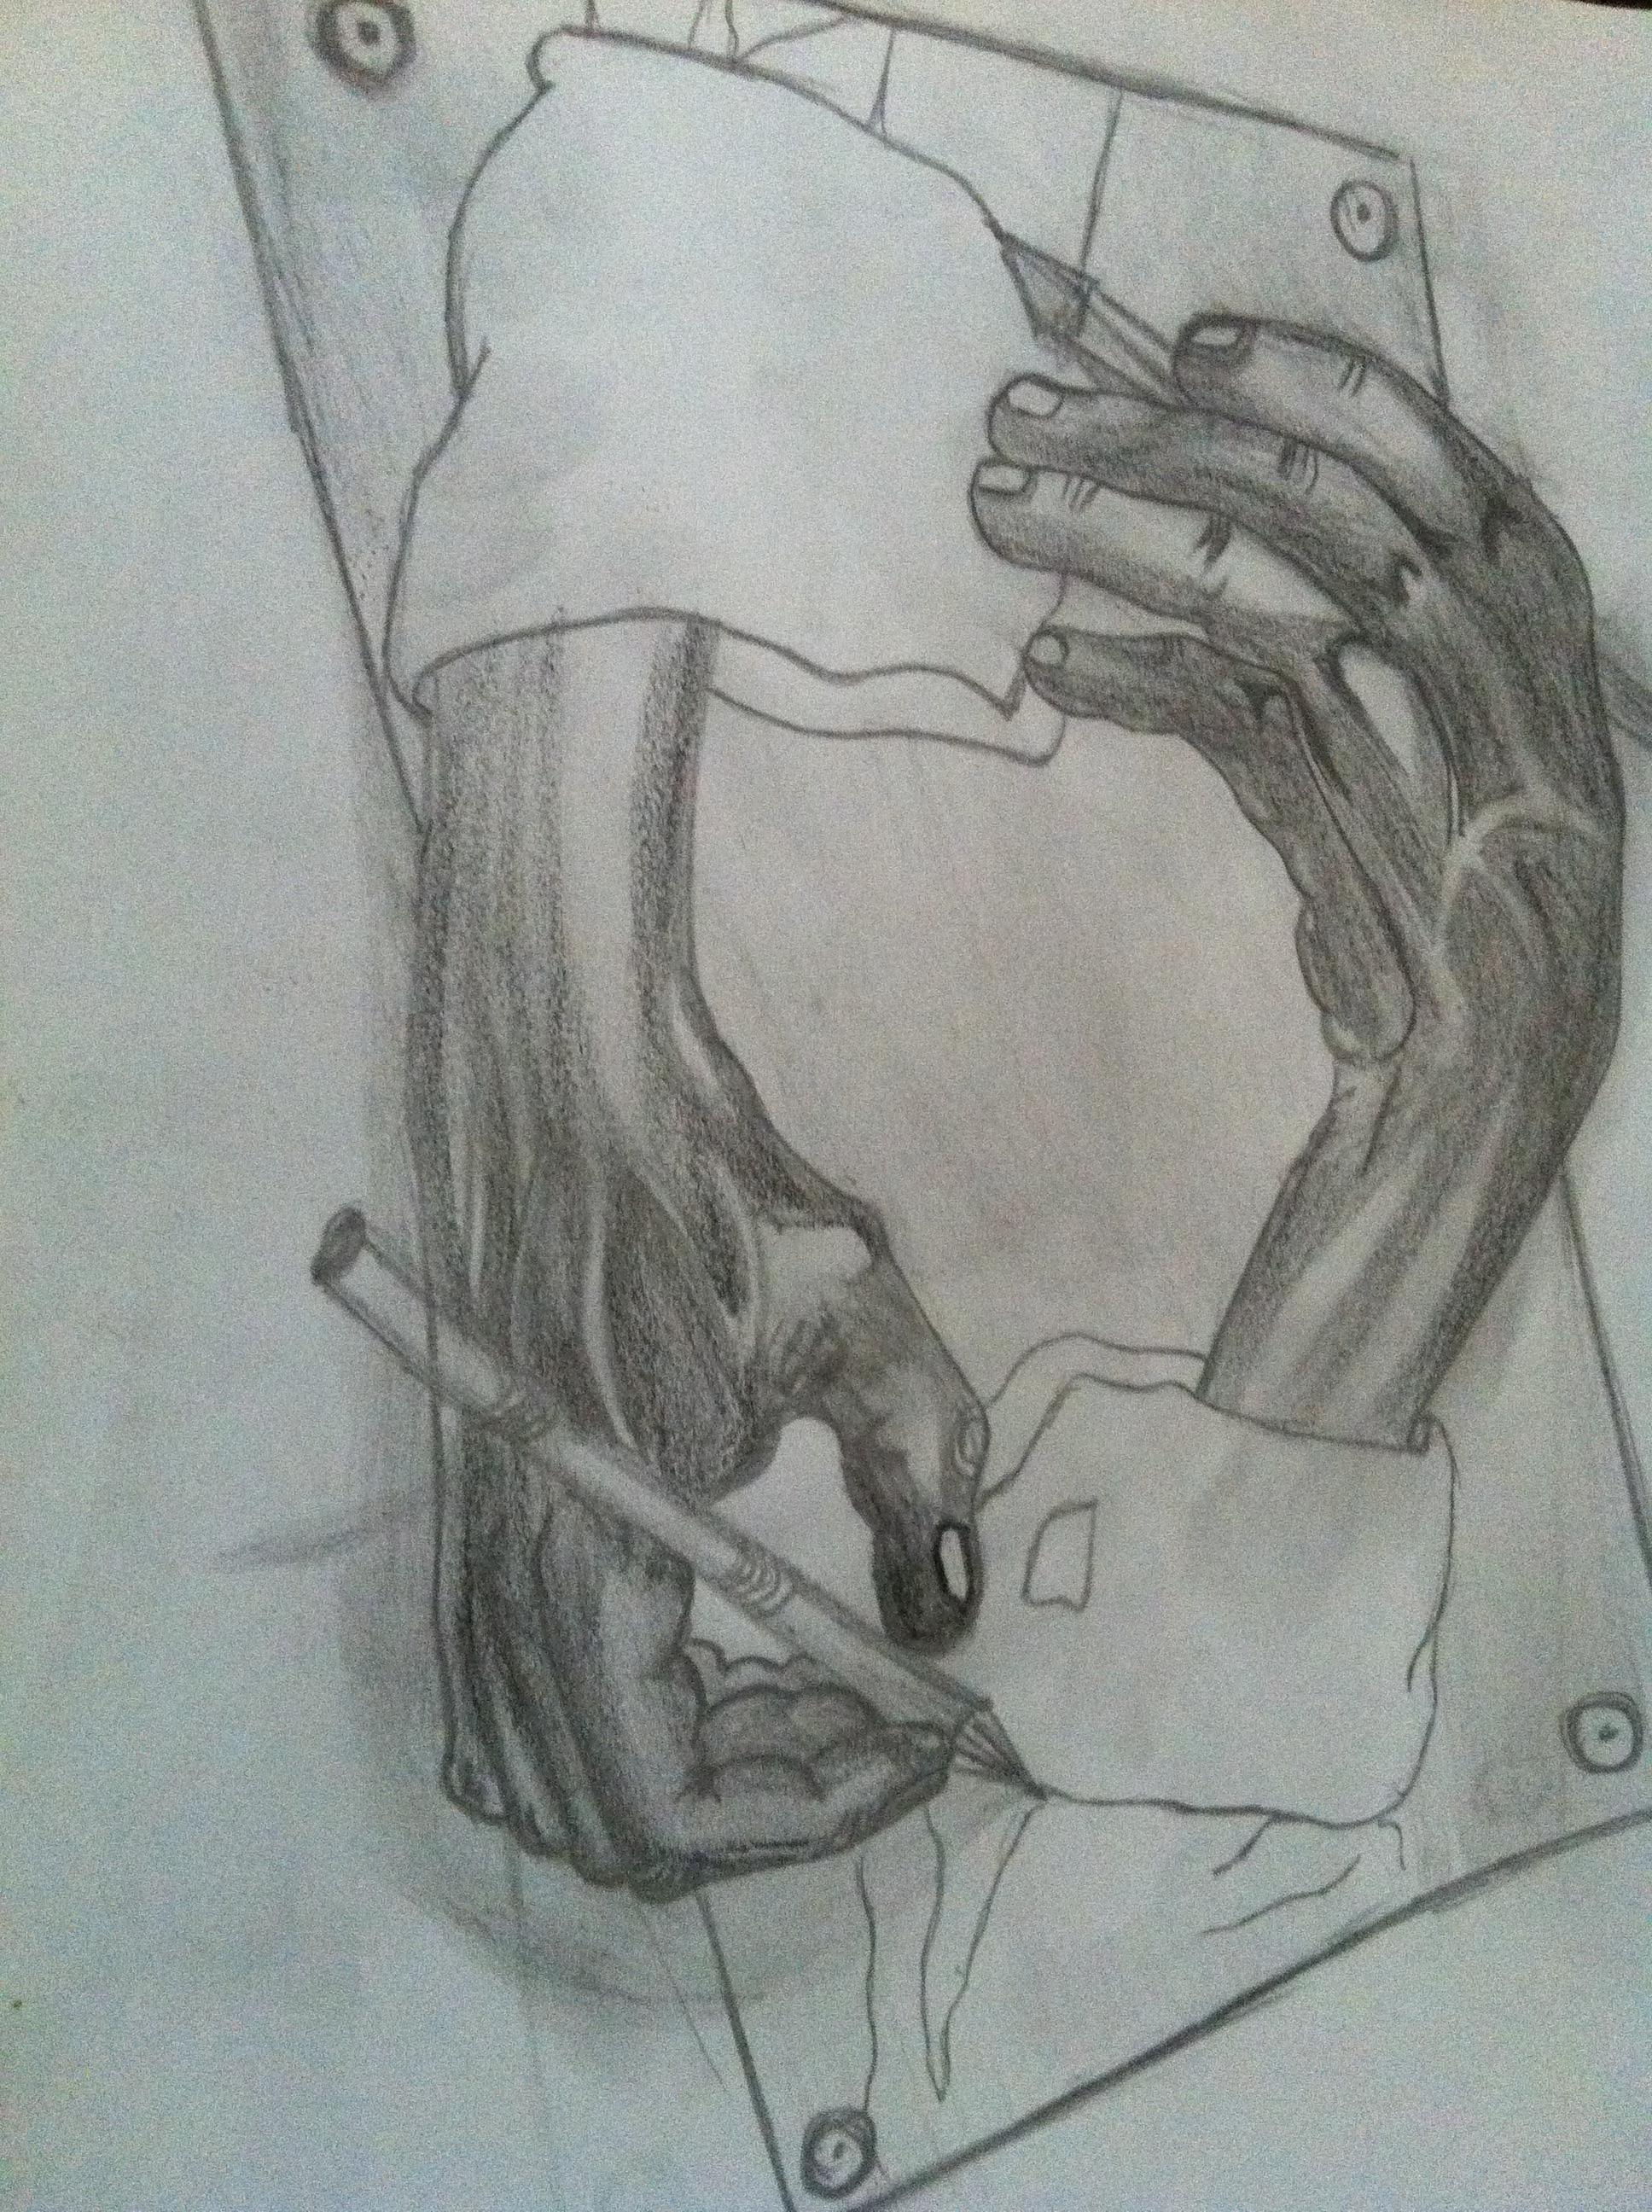 Karya seni lukisan sketsa gambar ilustrasi tangan pensil gambar pensil lukisan arang angka menggambar